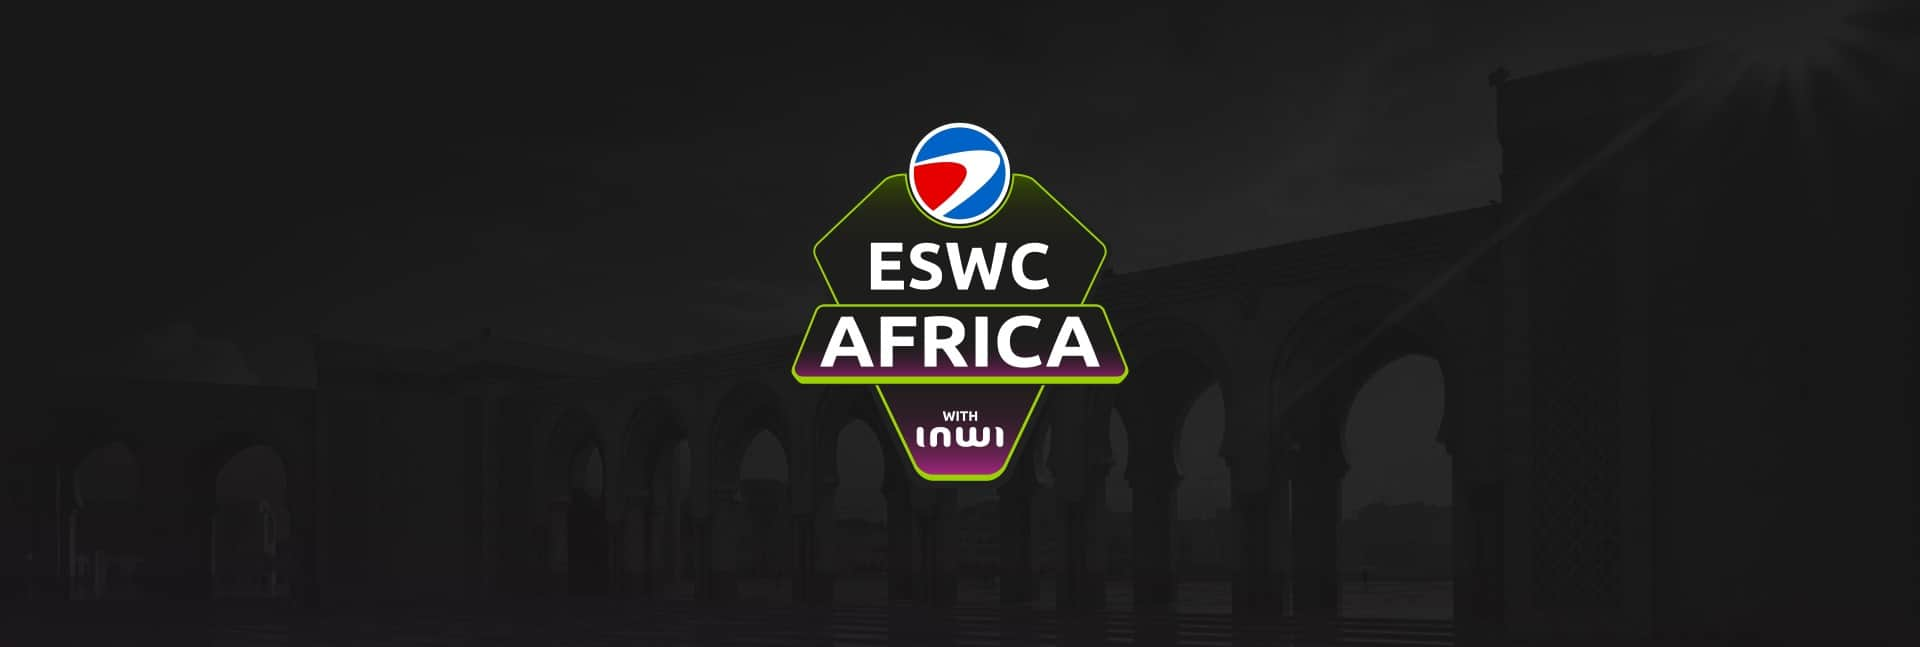 ESWC AFRICA 2018